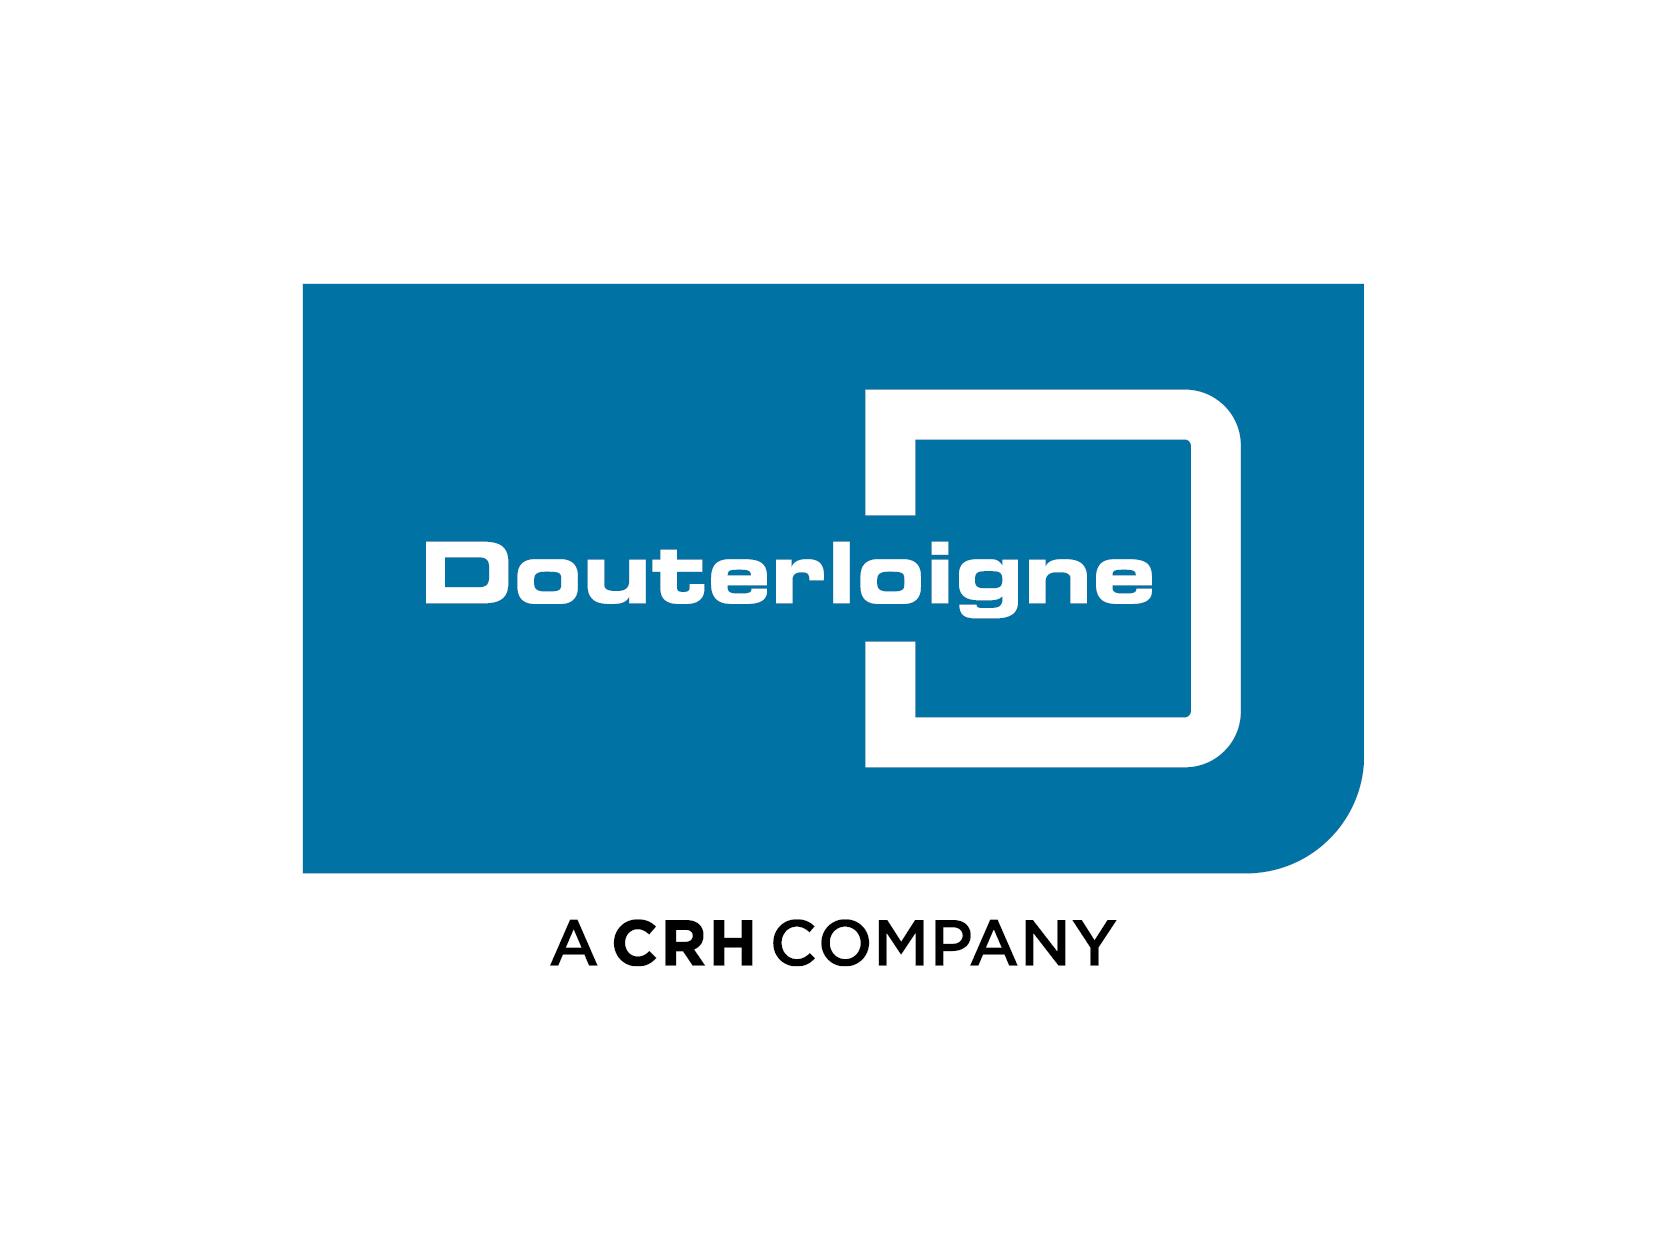 Douterloigne